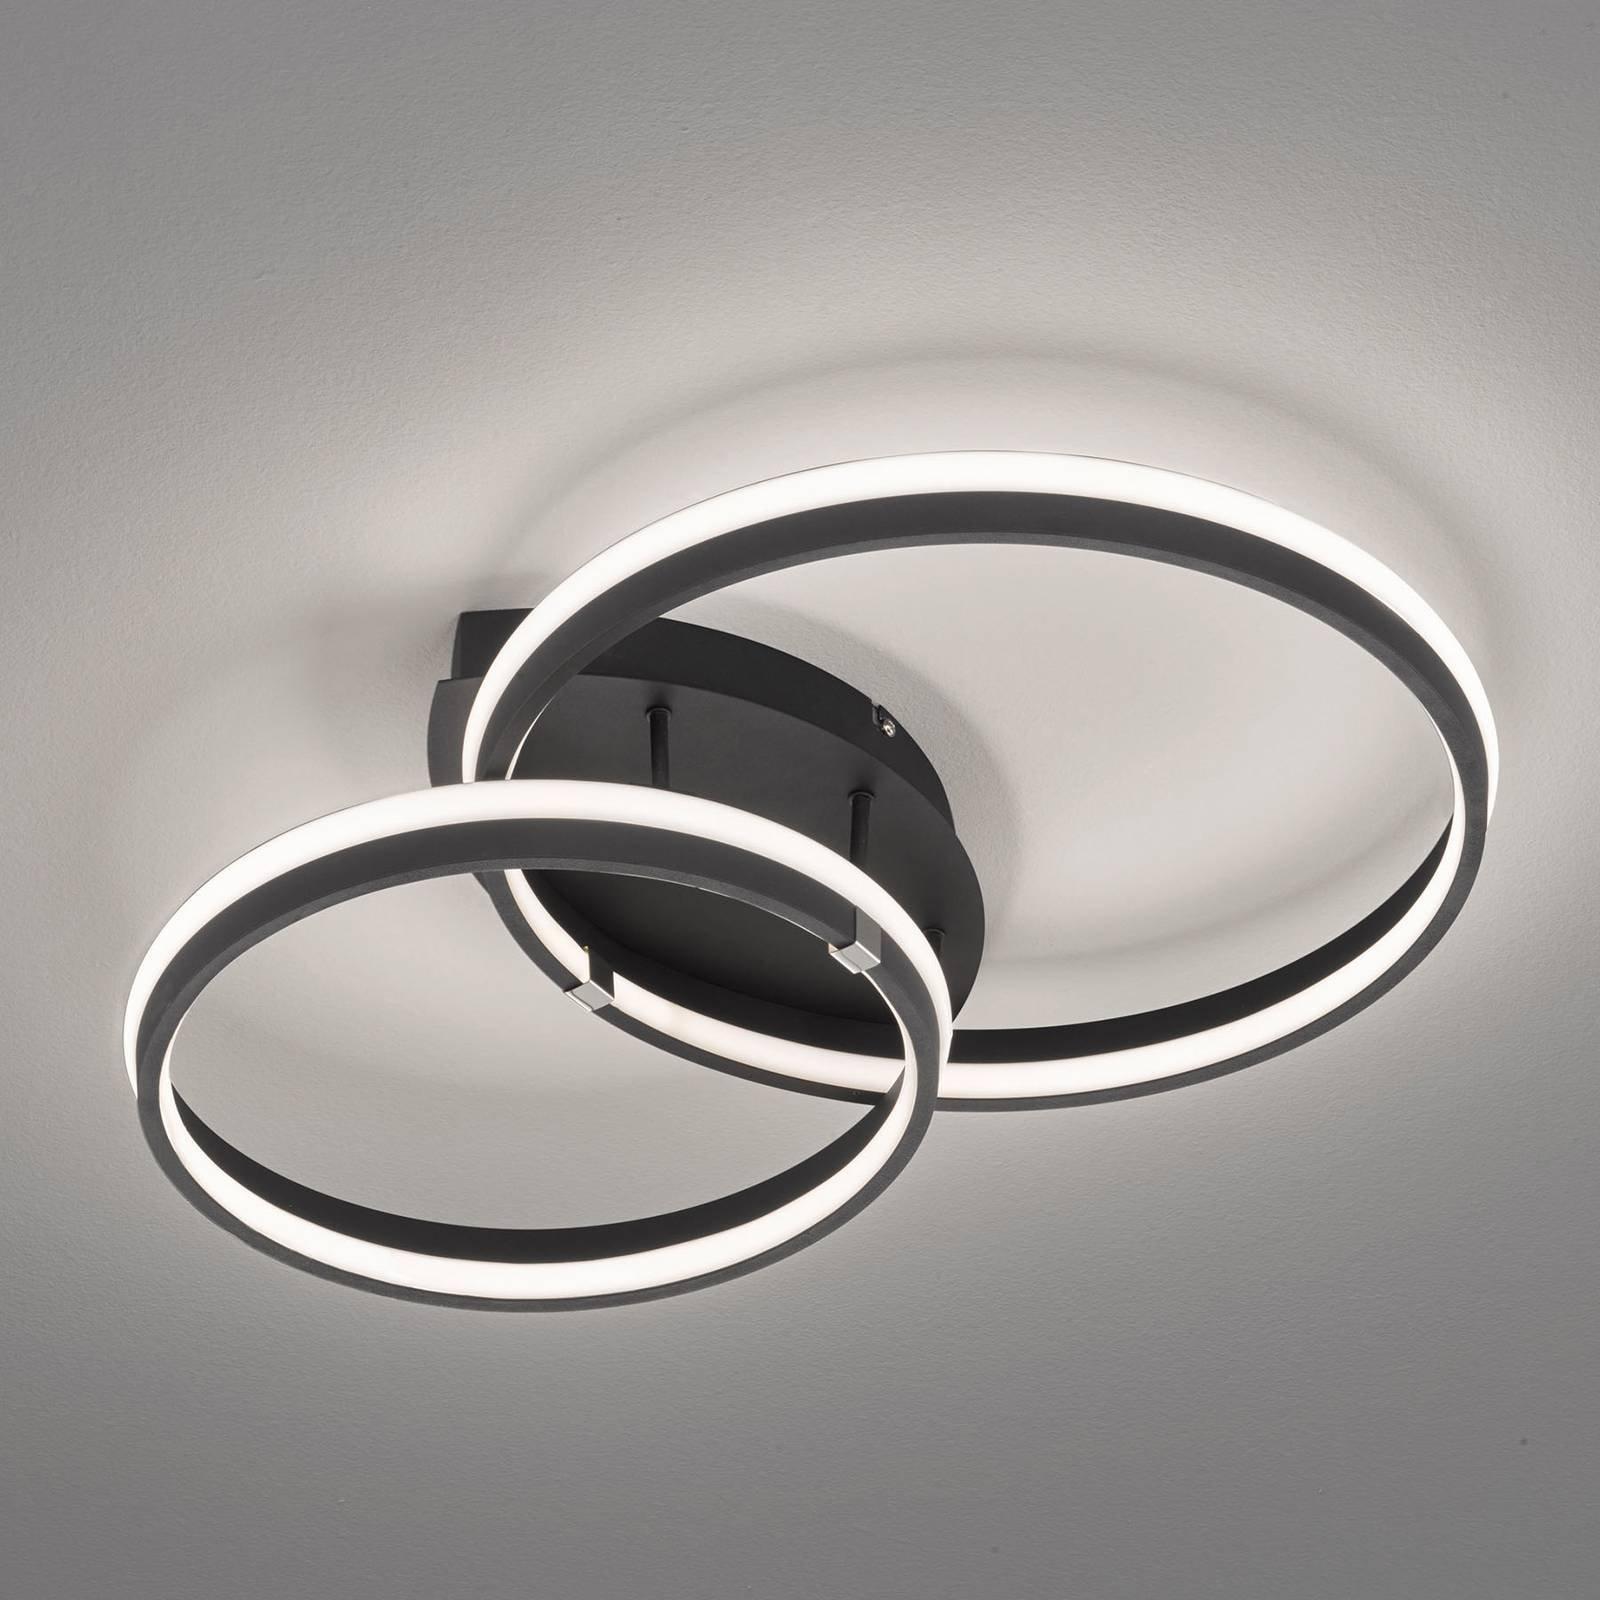 LED-taklampe Nomade, dimbar, matt svart